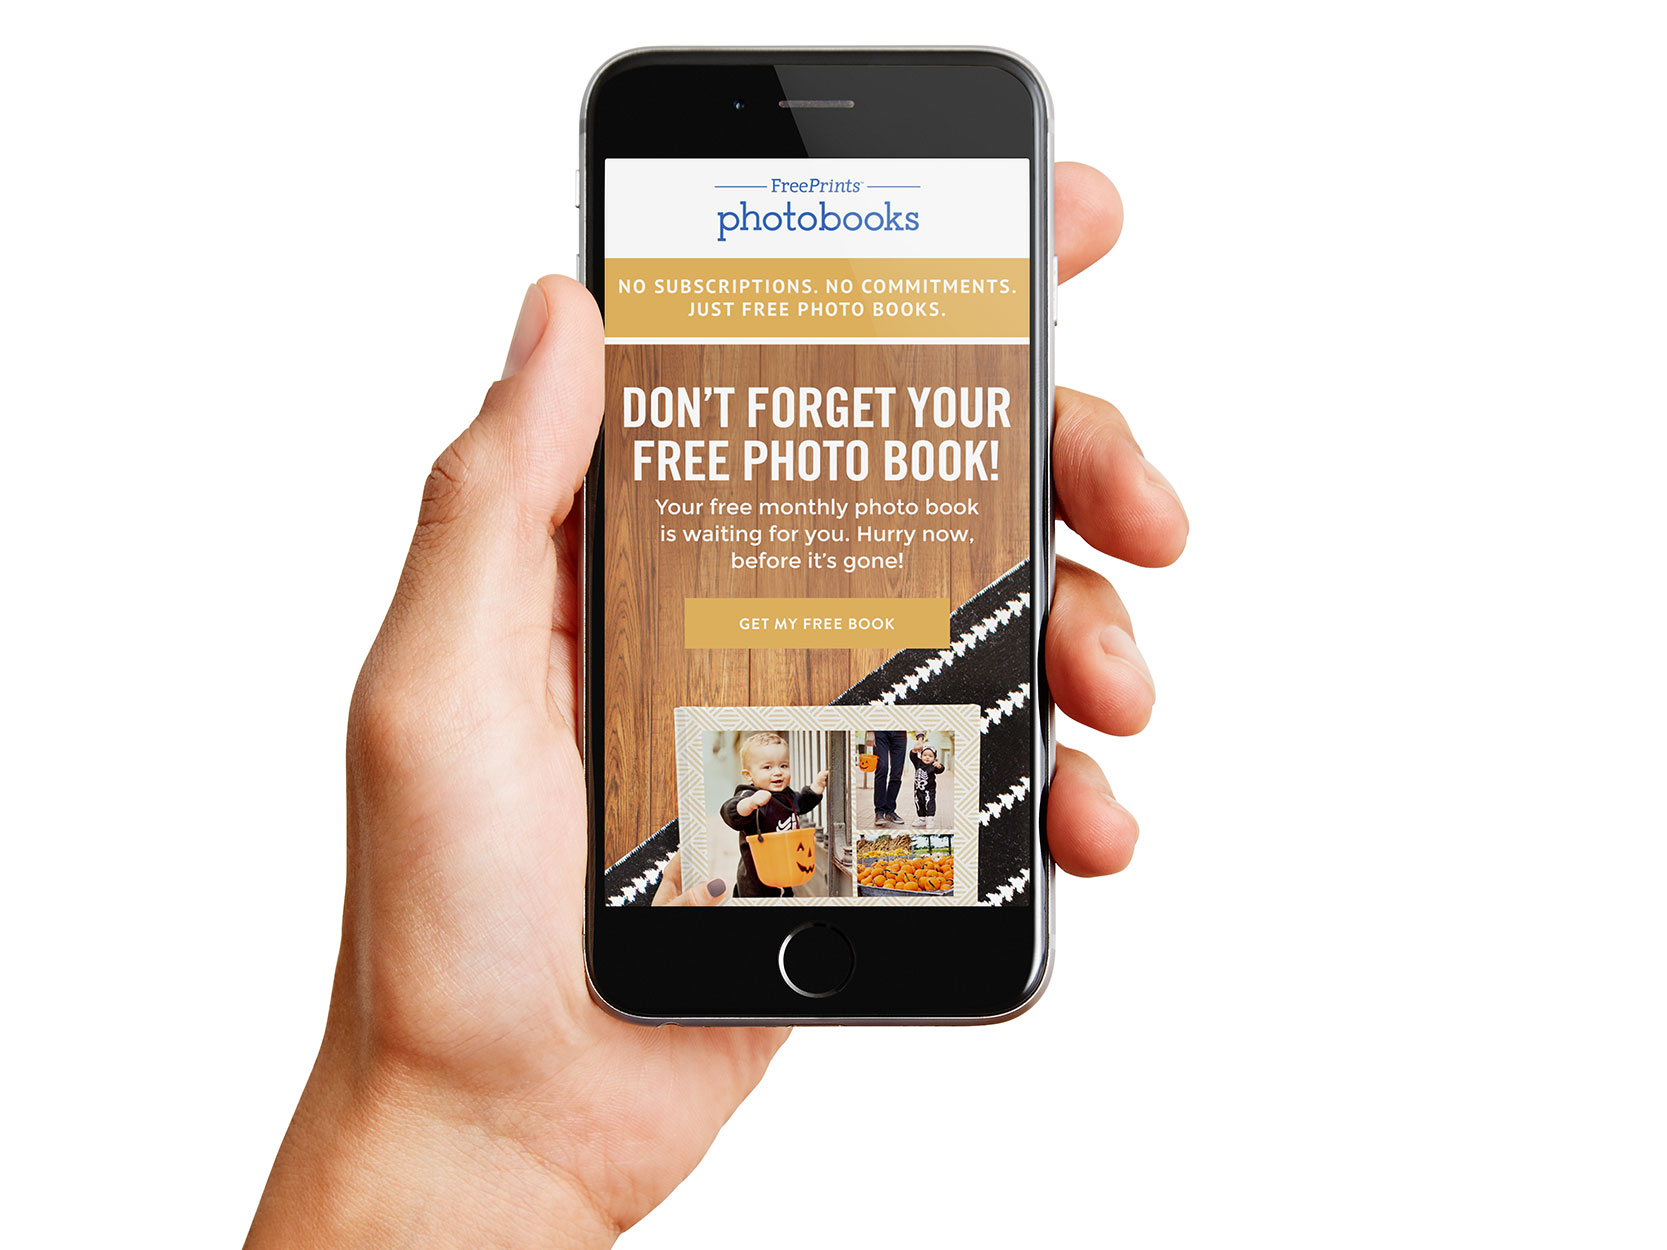 freeprints photobooks email campaigns